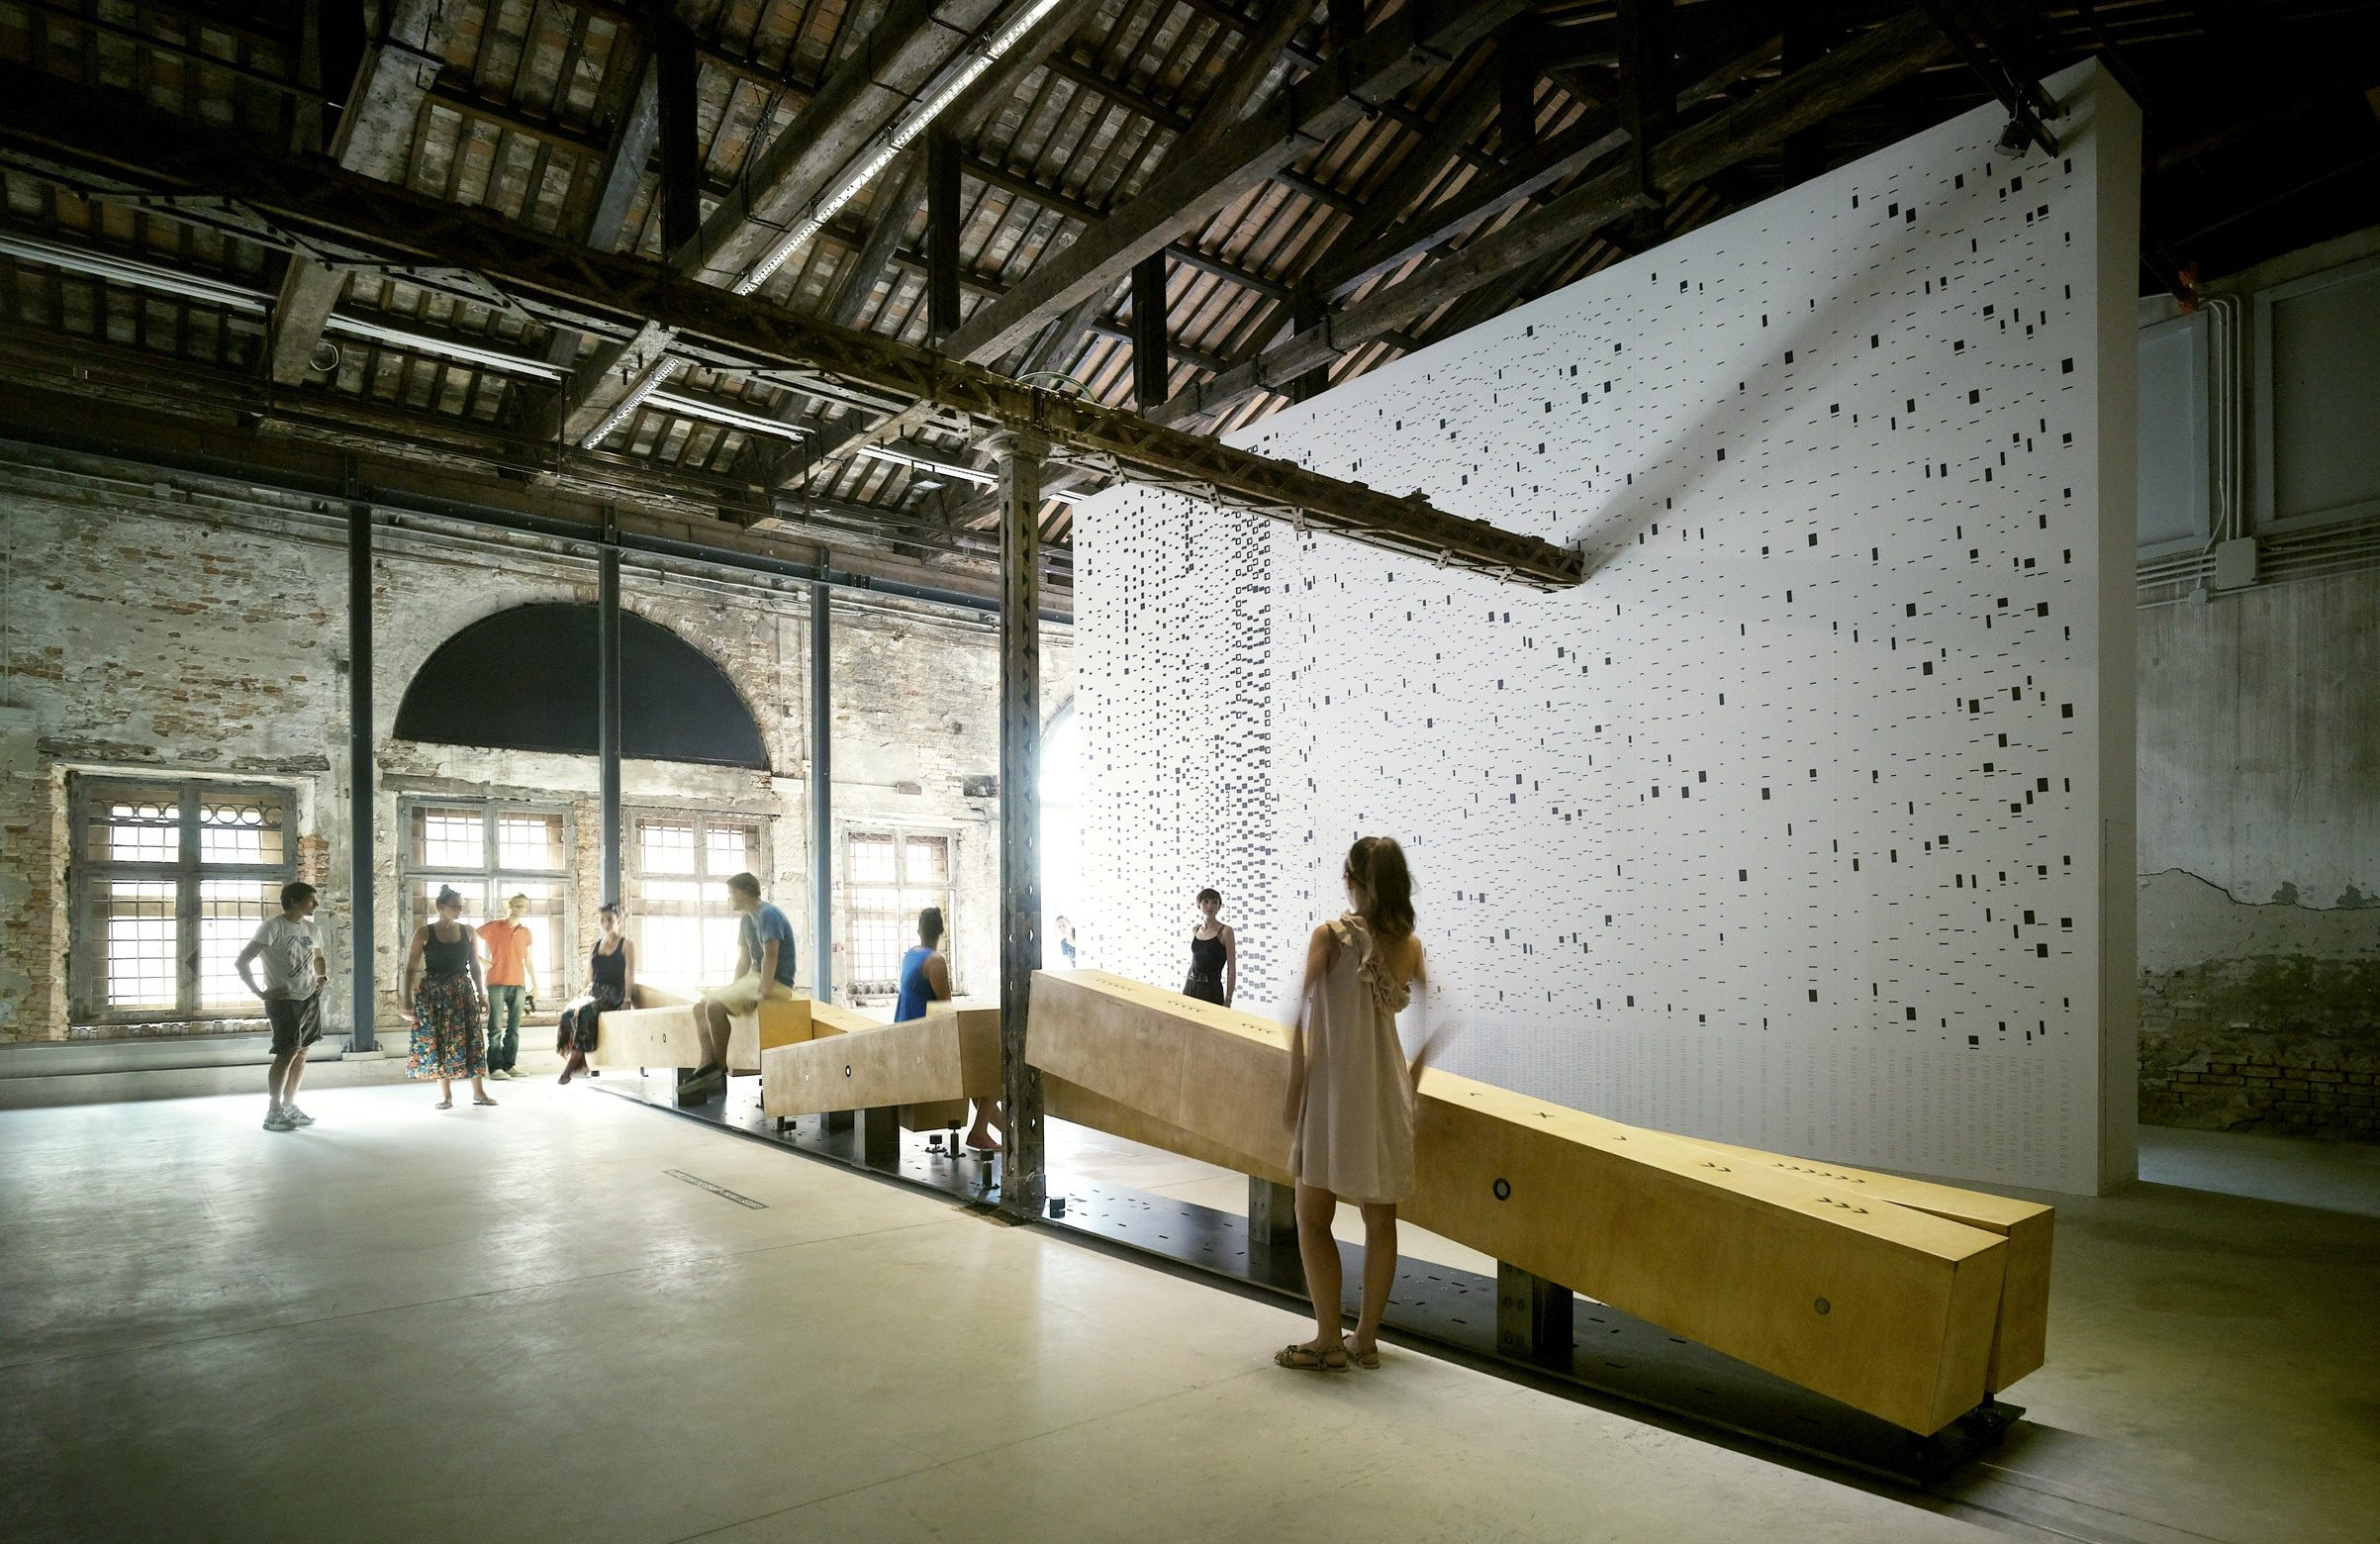 ground by irish architects heneghan peng at la biennale di venezia